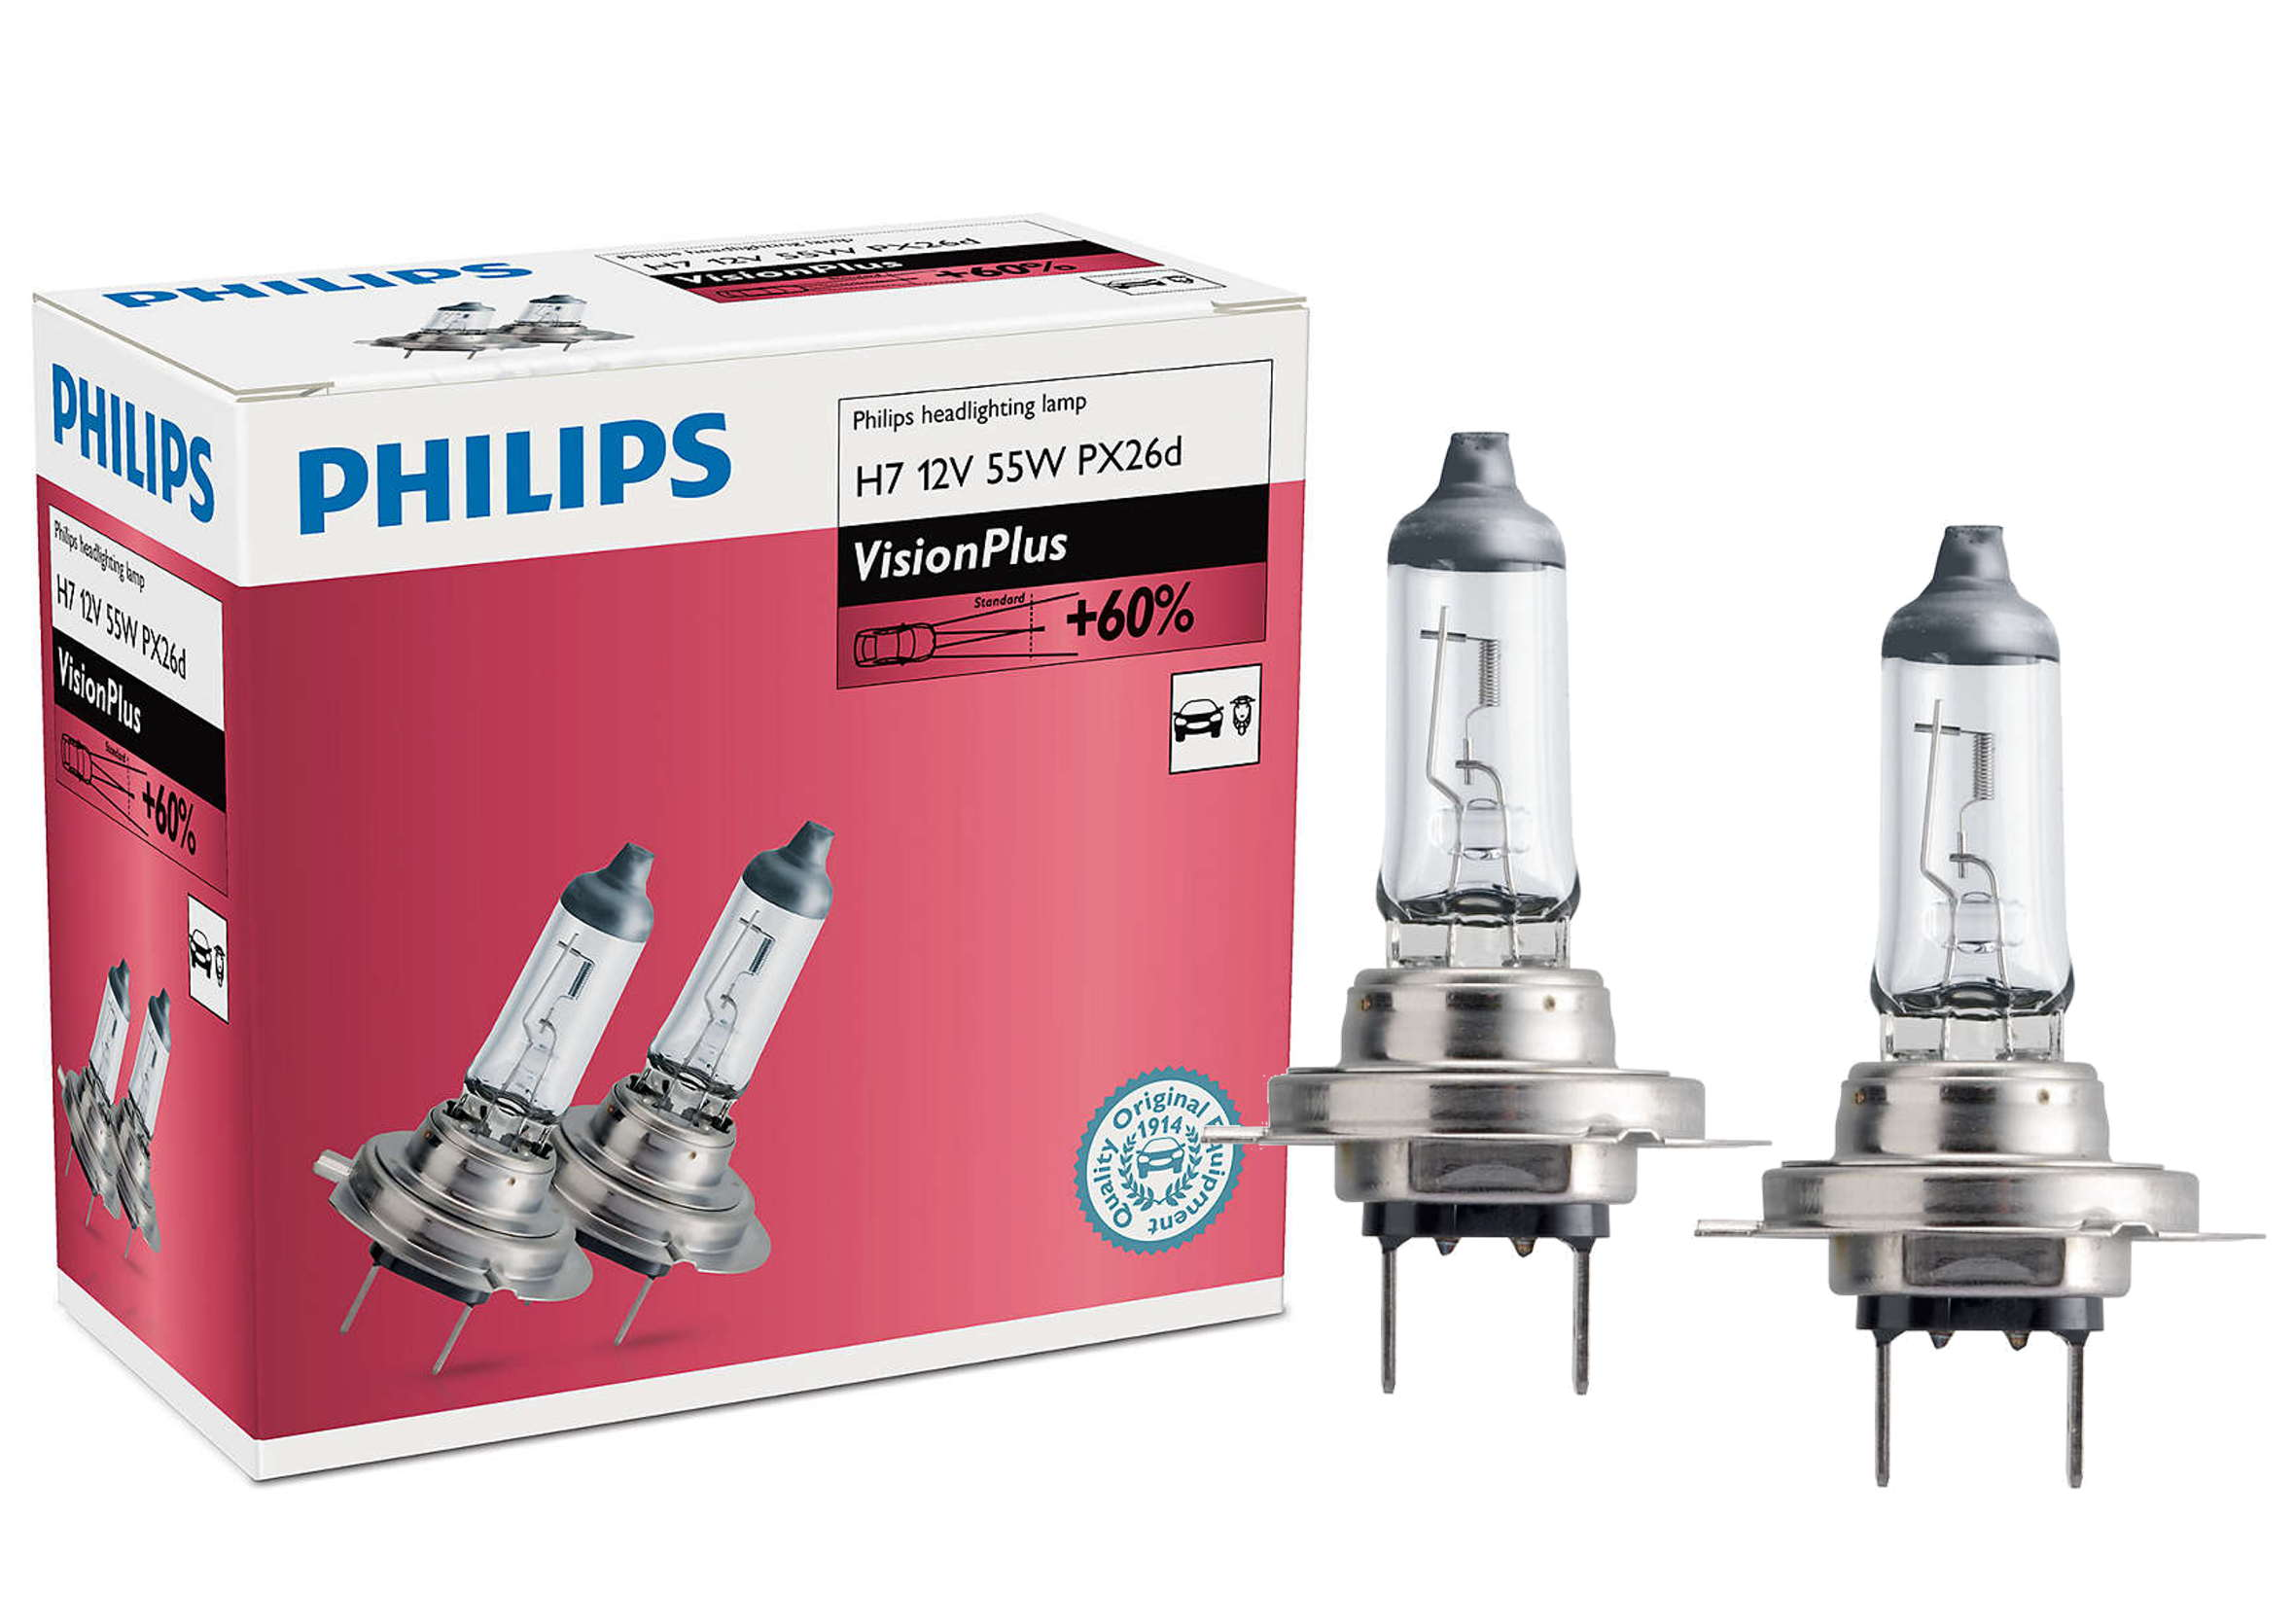 Philips VisionPlus +60% H7 12V 55W PX26d 2szt. Żarówki Halogenowe